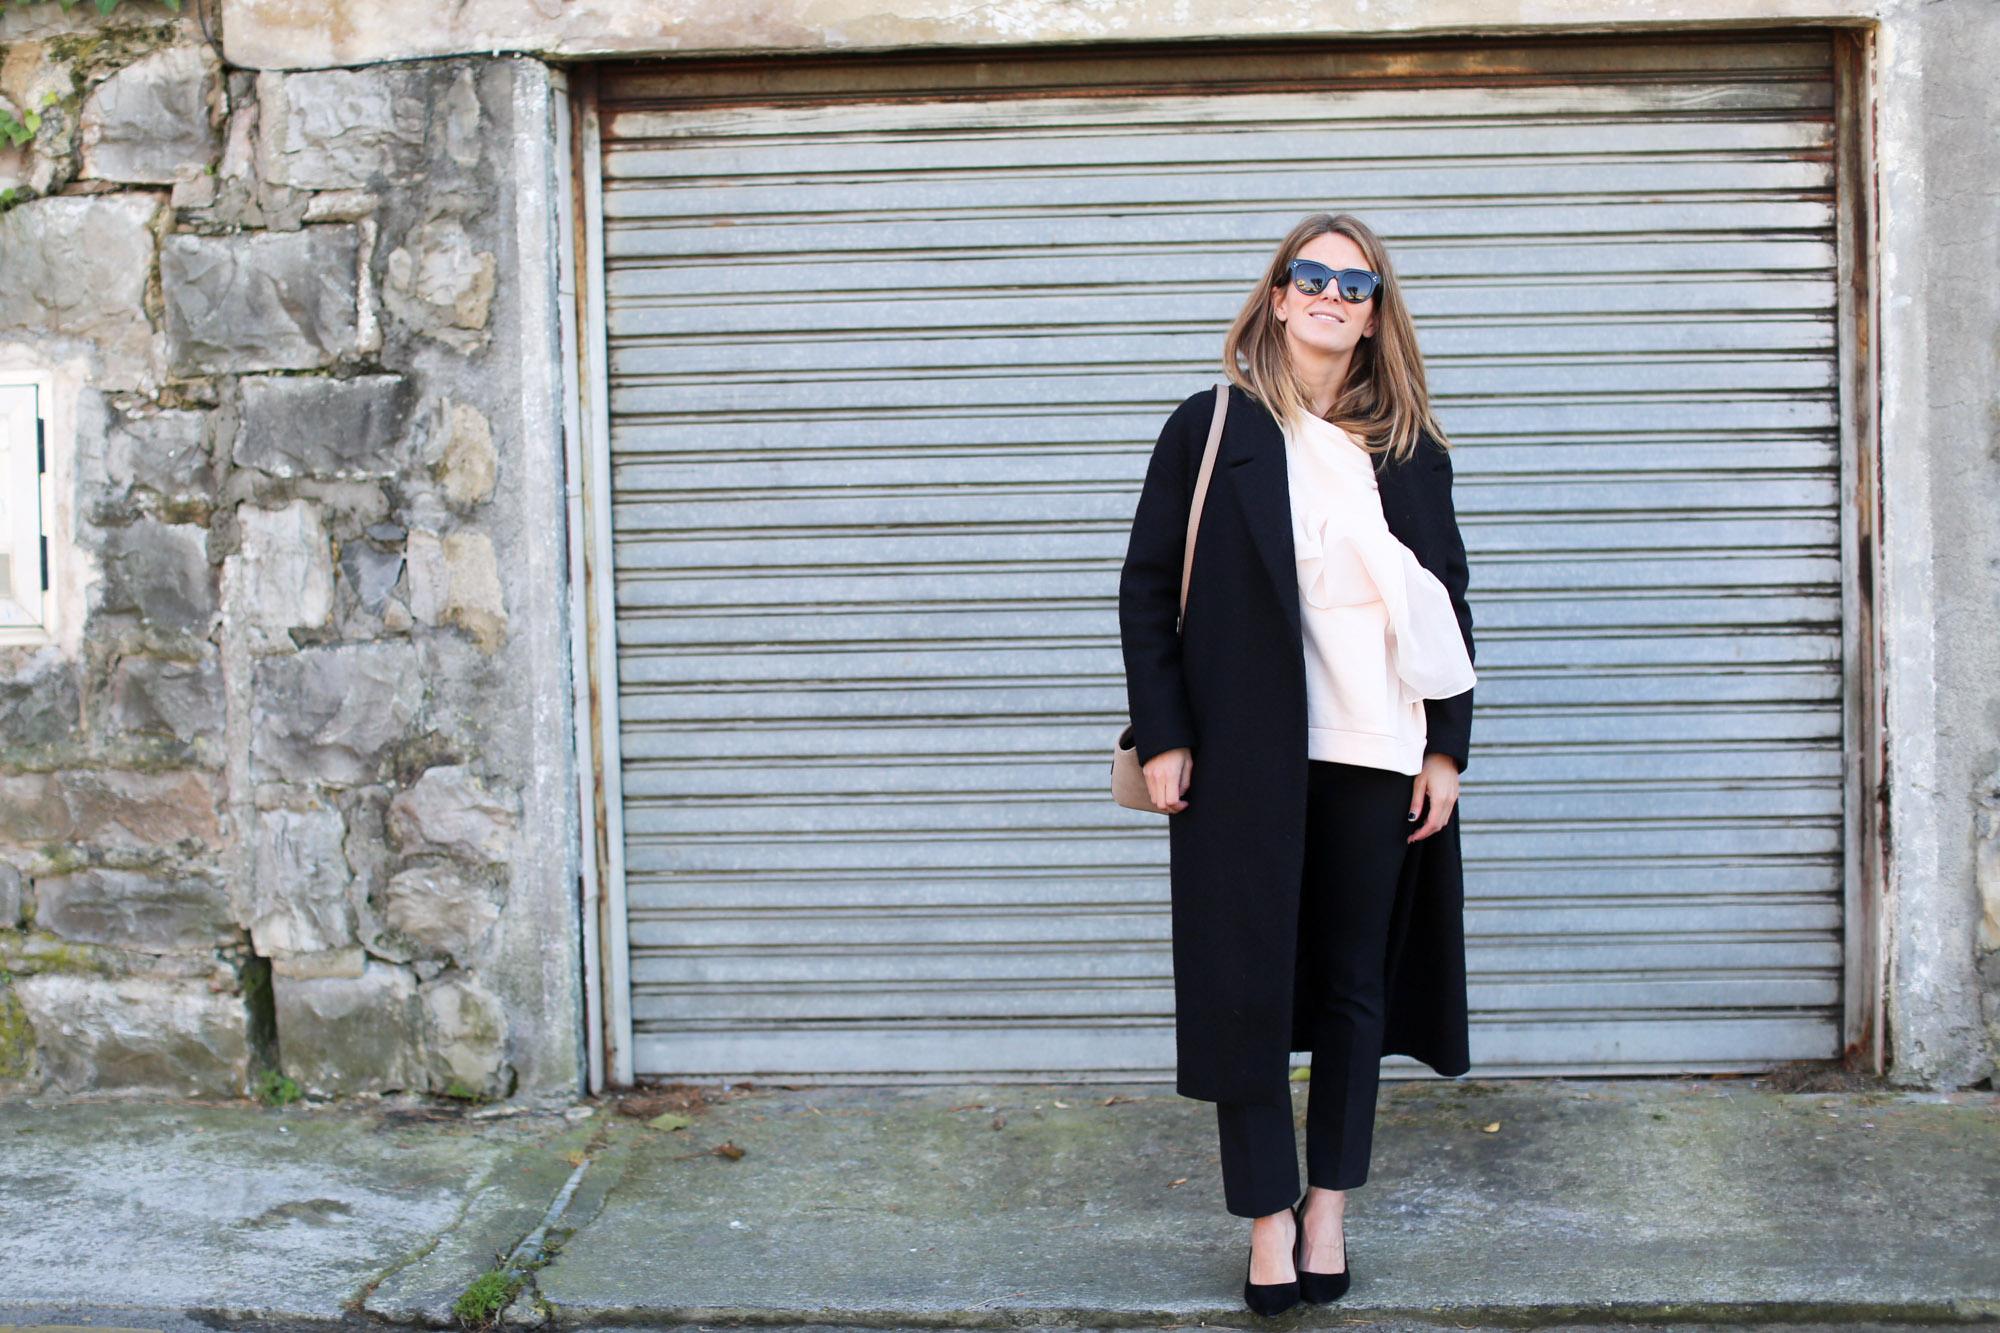 clochet_streetstyle_fashionblogger_cosnuderibbonsweatshirt_otherstoriessuedestilettos_coswoollongcoat-3